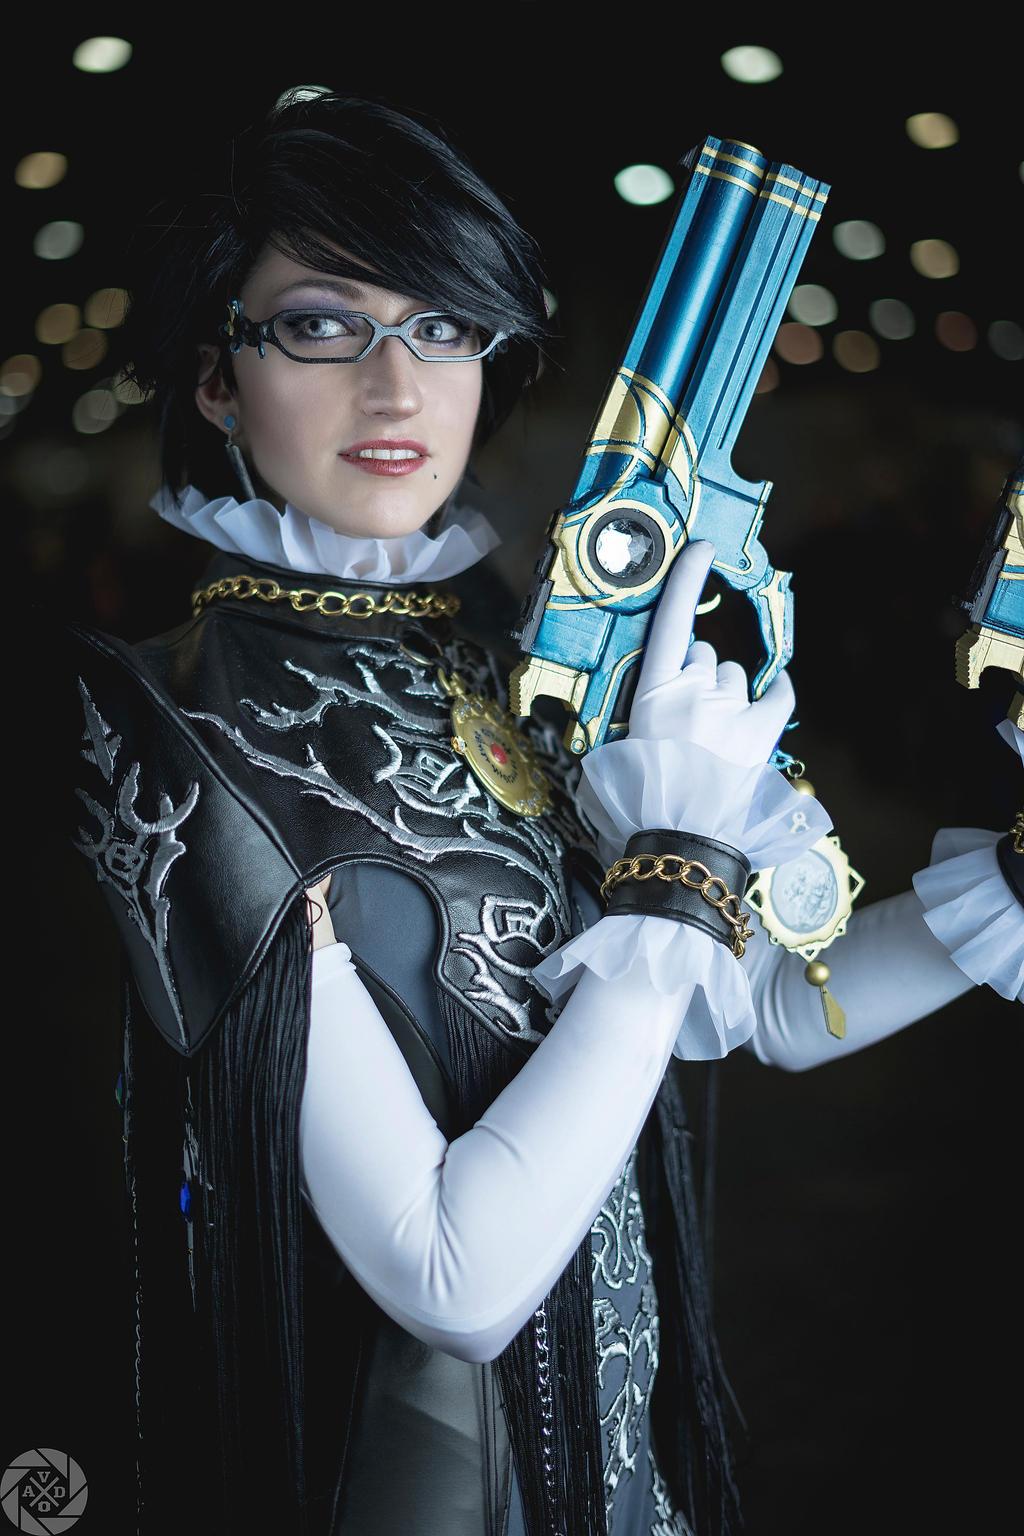 Bayonetta cosplay by Nebulaluben